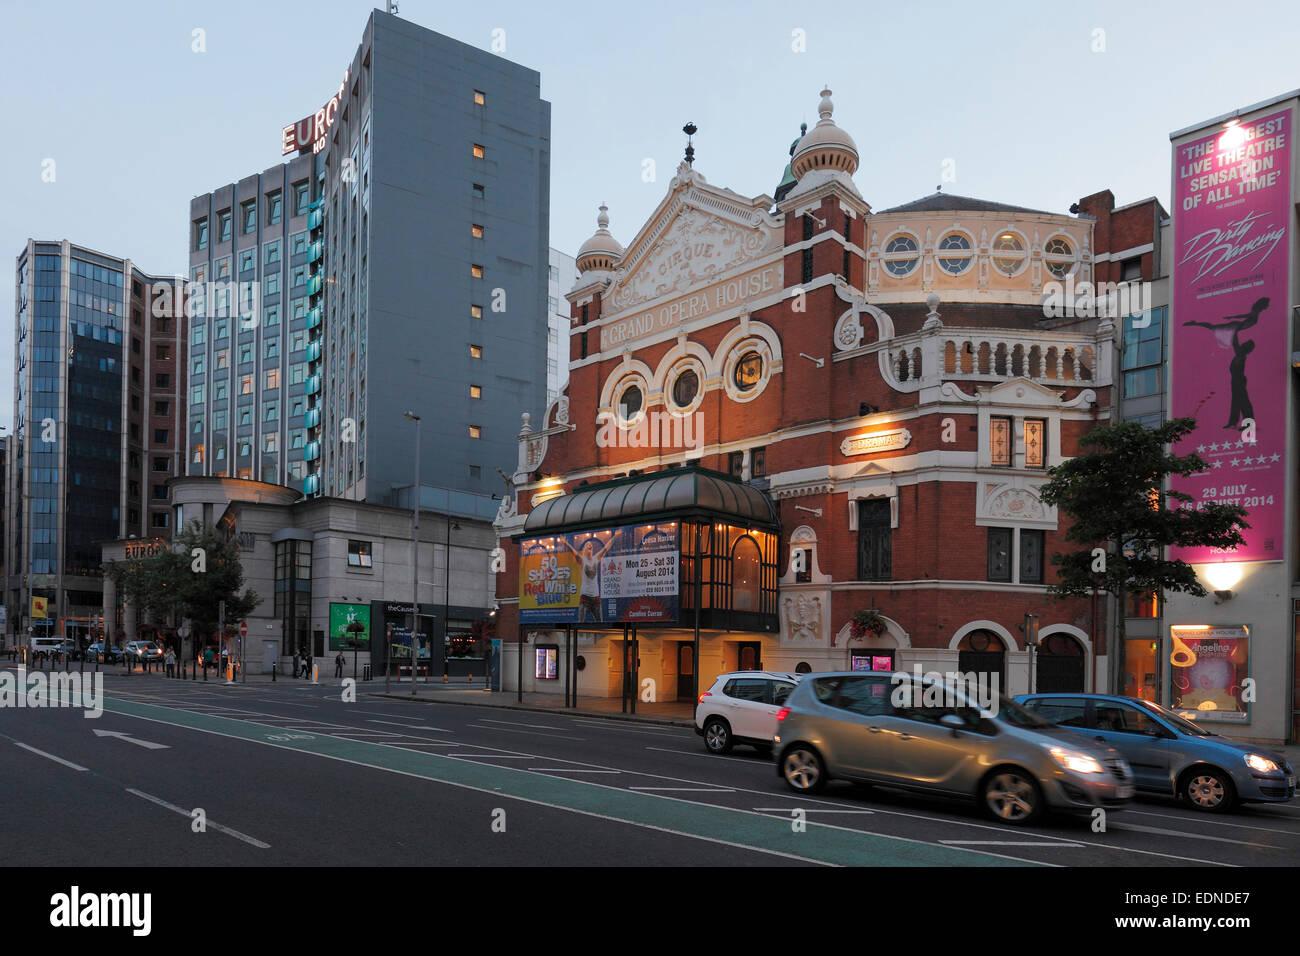 Belfast Grand Opera House and Europa Hotel, Great Victoria Street, Belfast, Northern Ireland - Stock Image